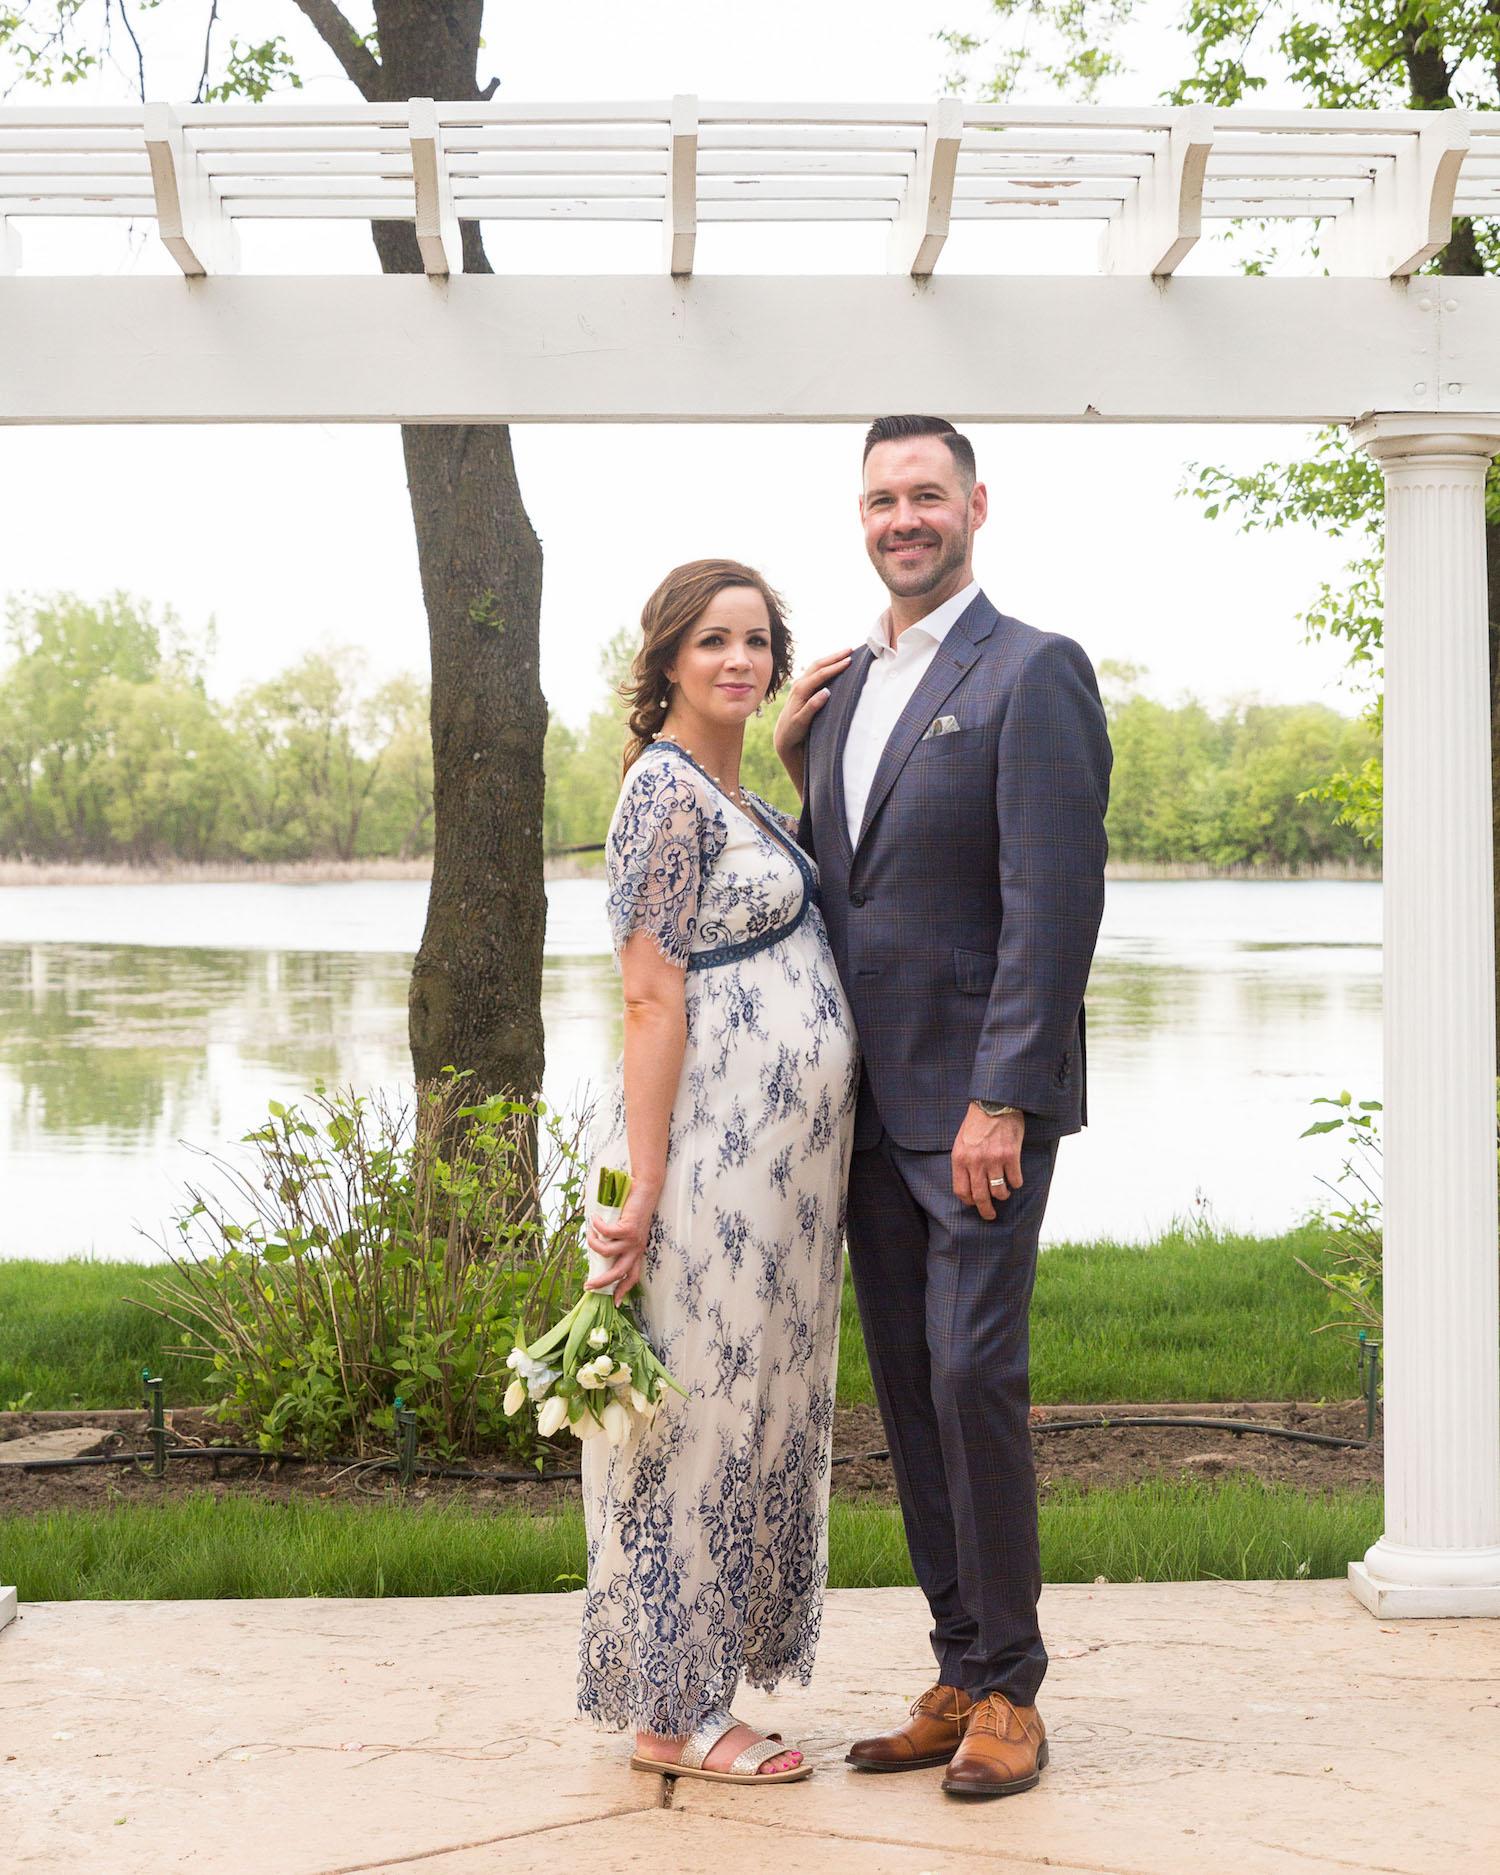 Cindyrella's Garden, pregnant bride in blue and white lace wedding dress,